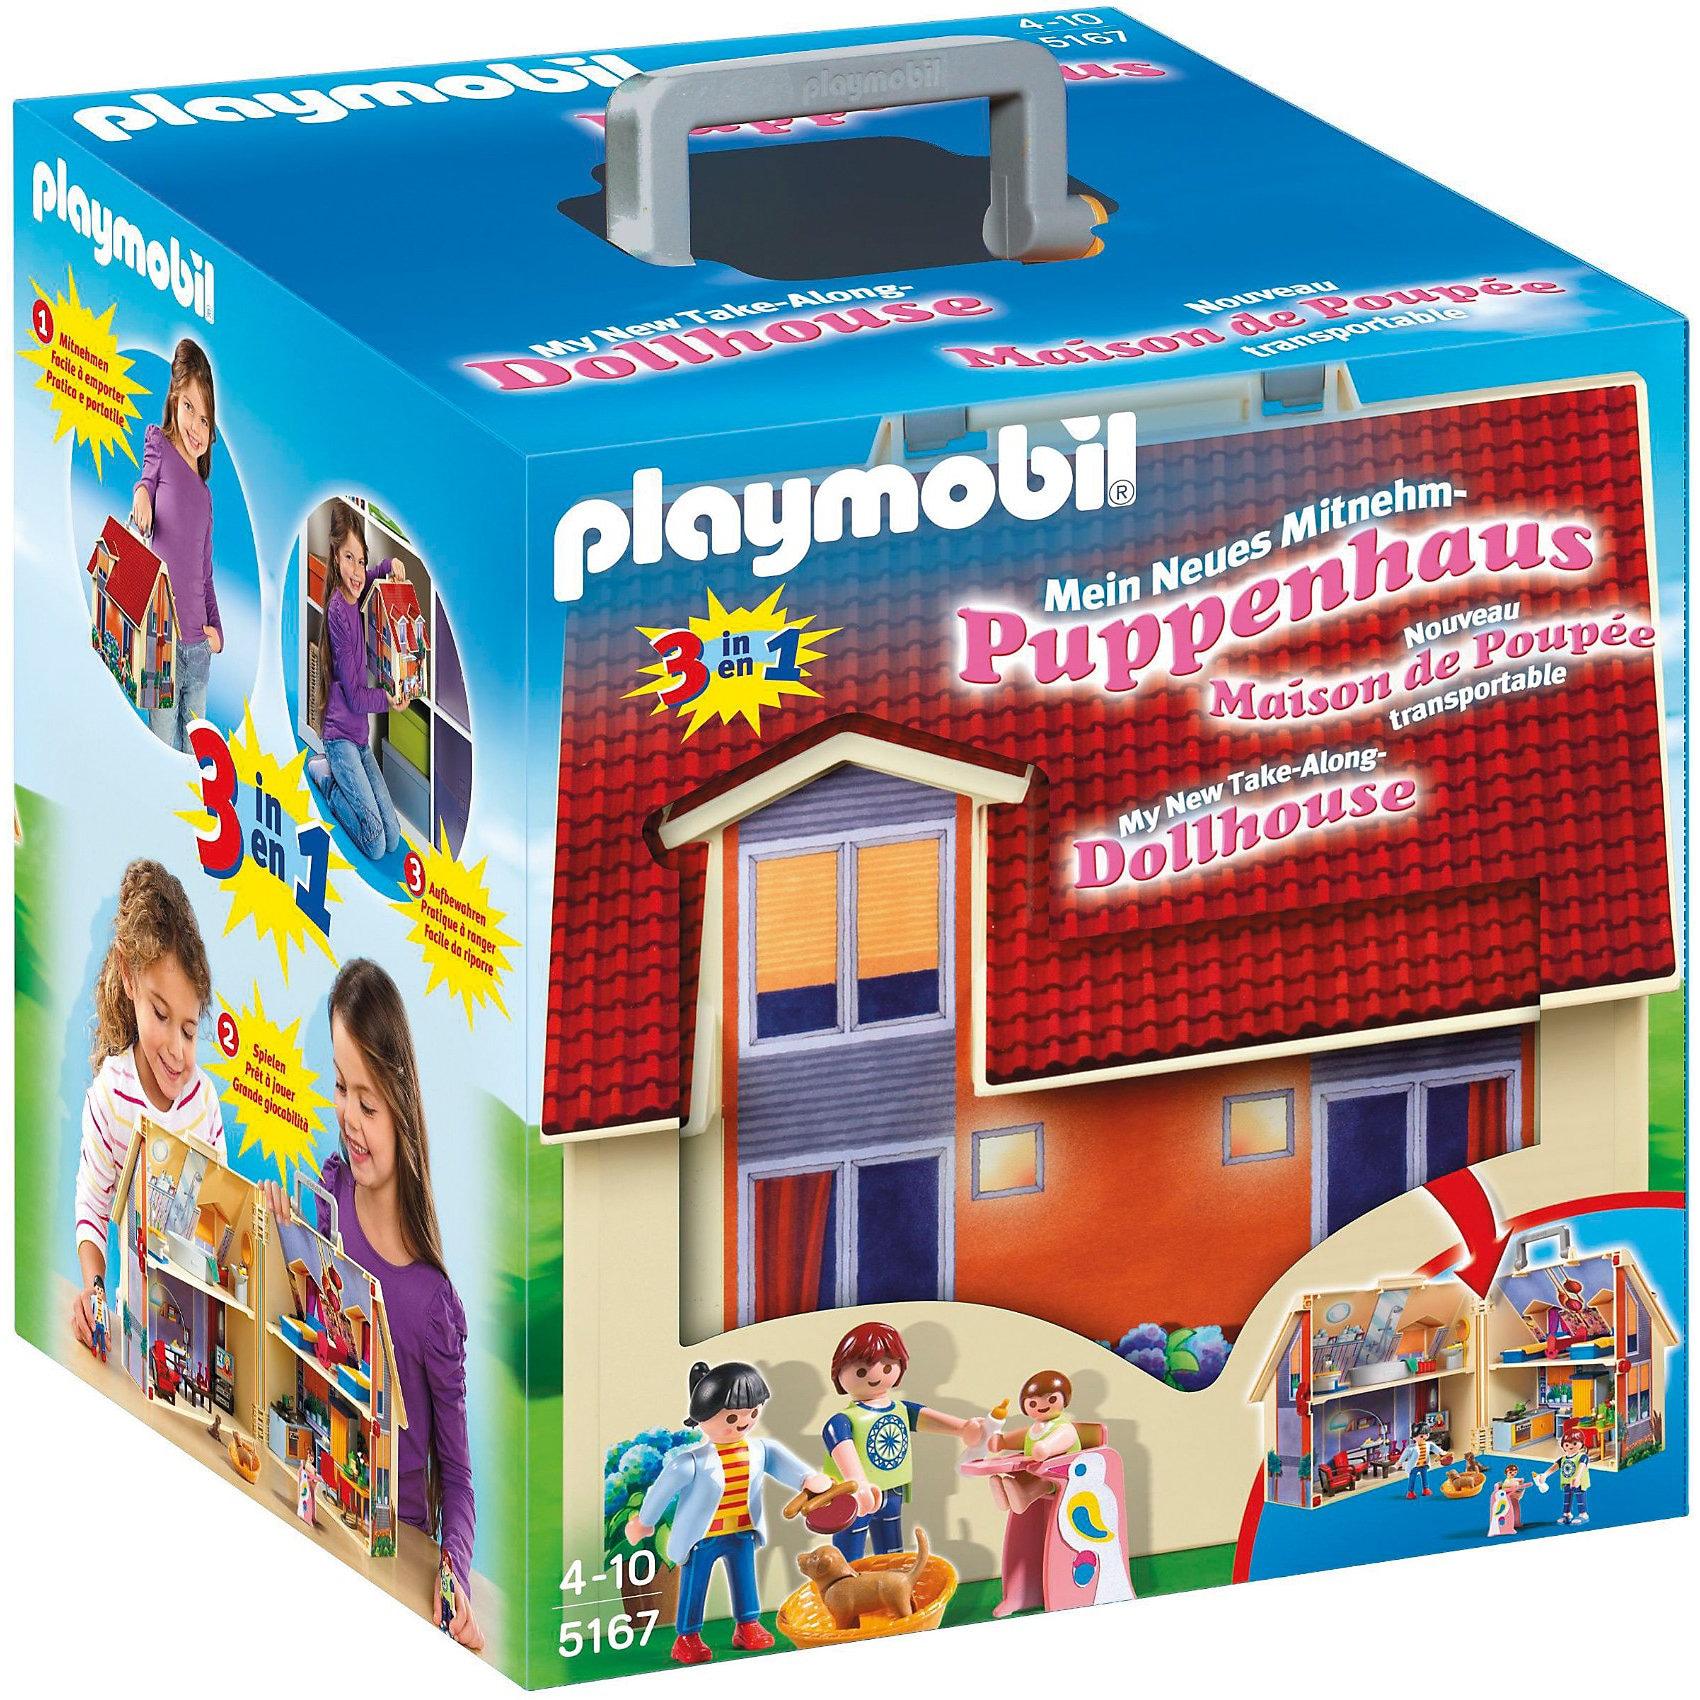 Playmobil® 5167 Mitnehm-Puppenhaus